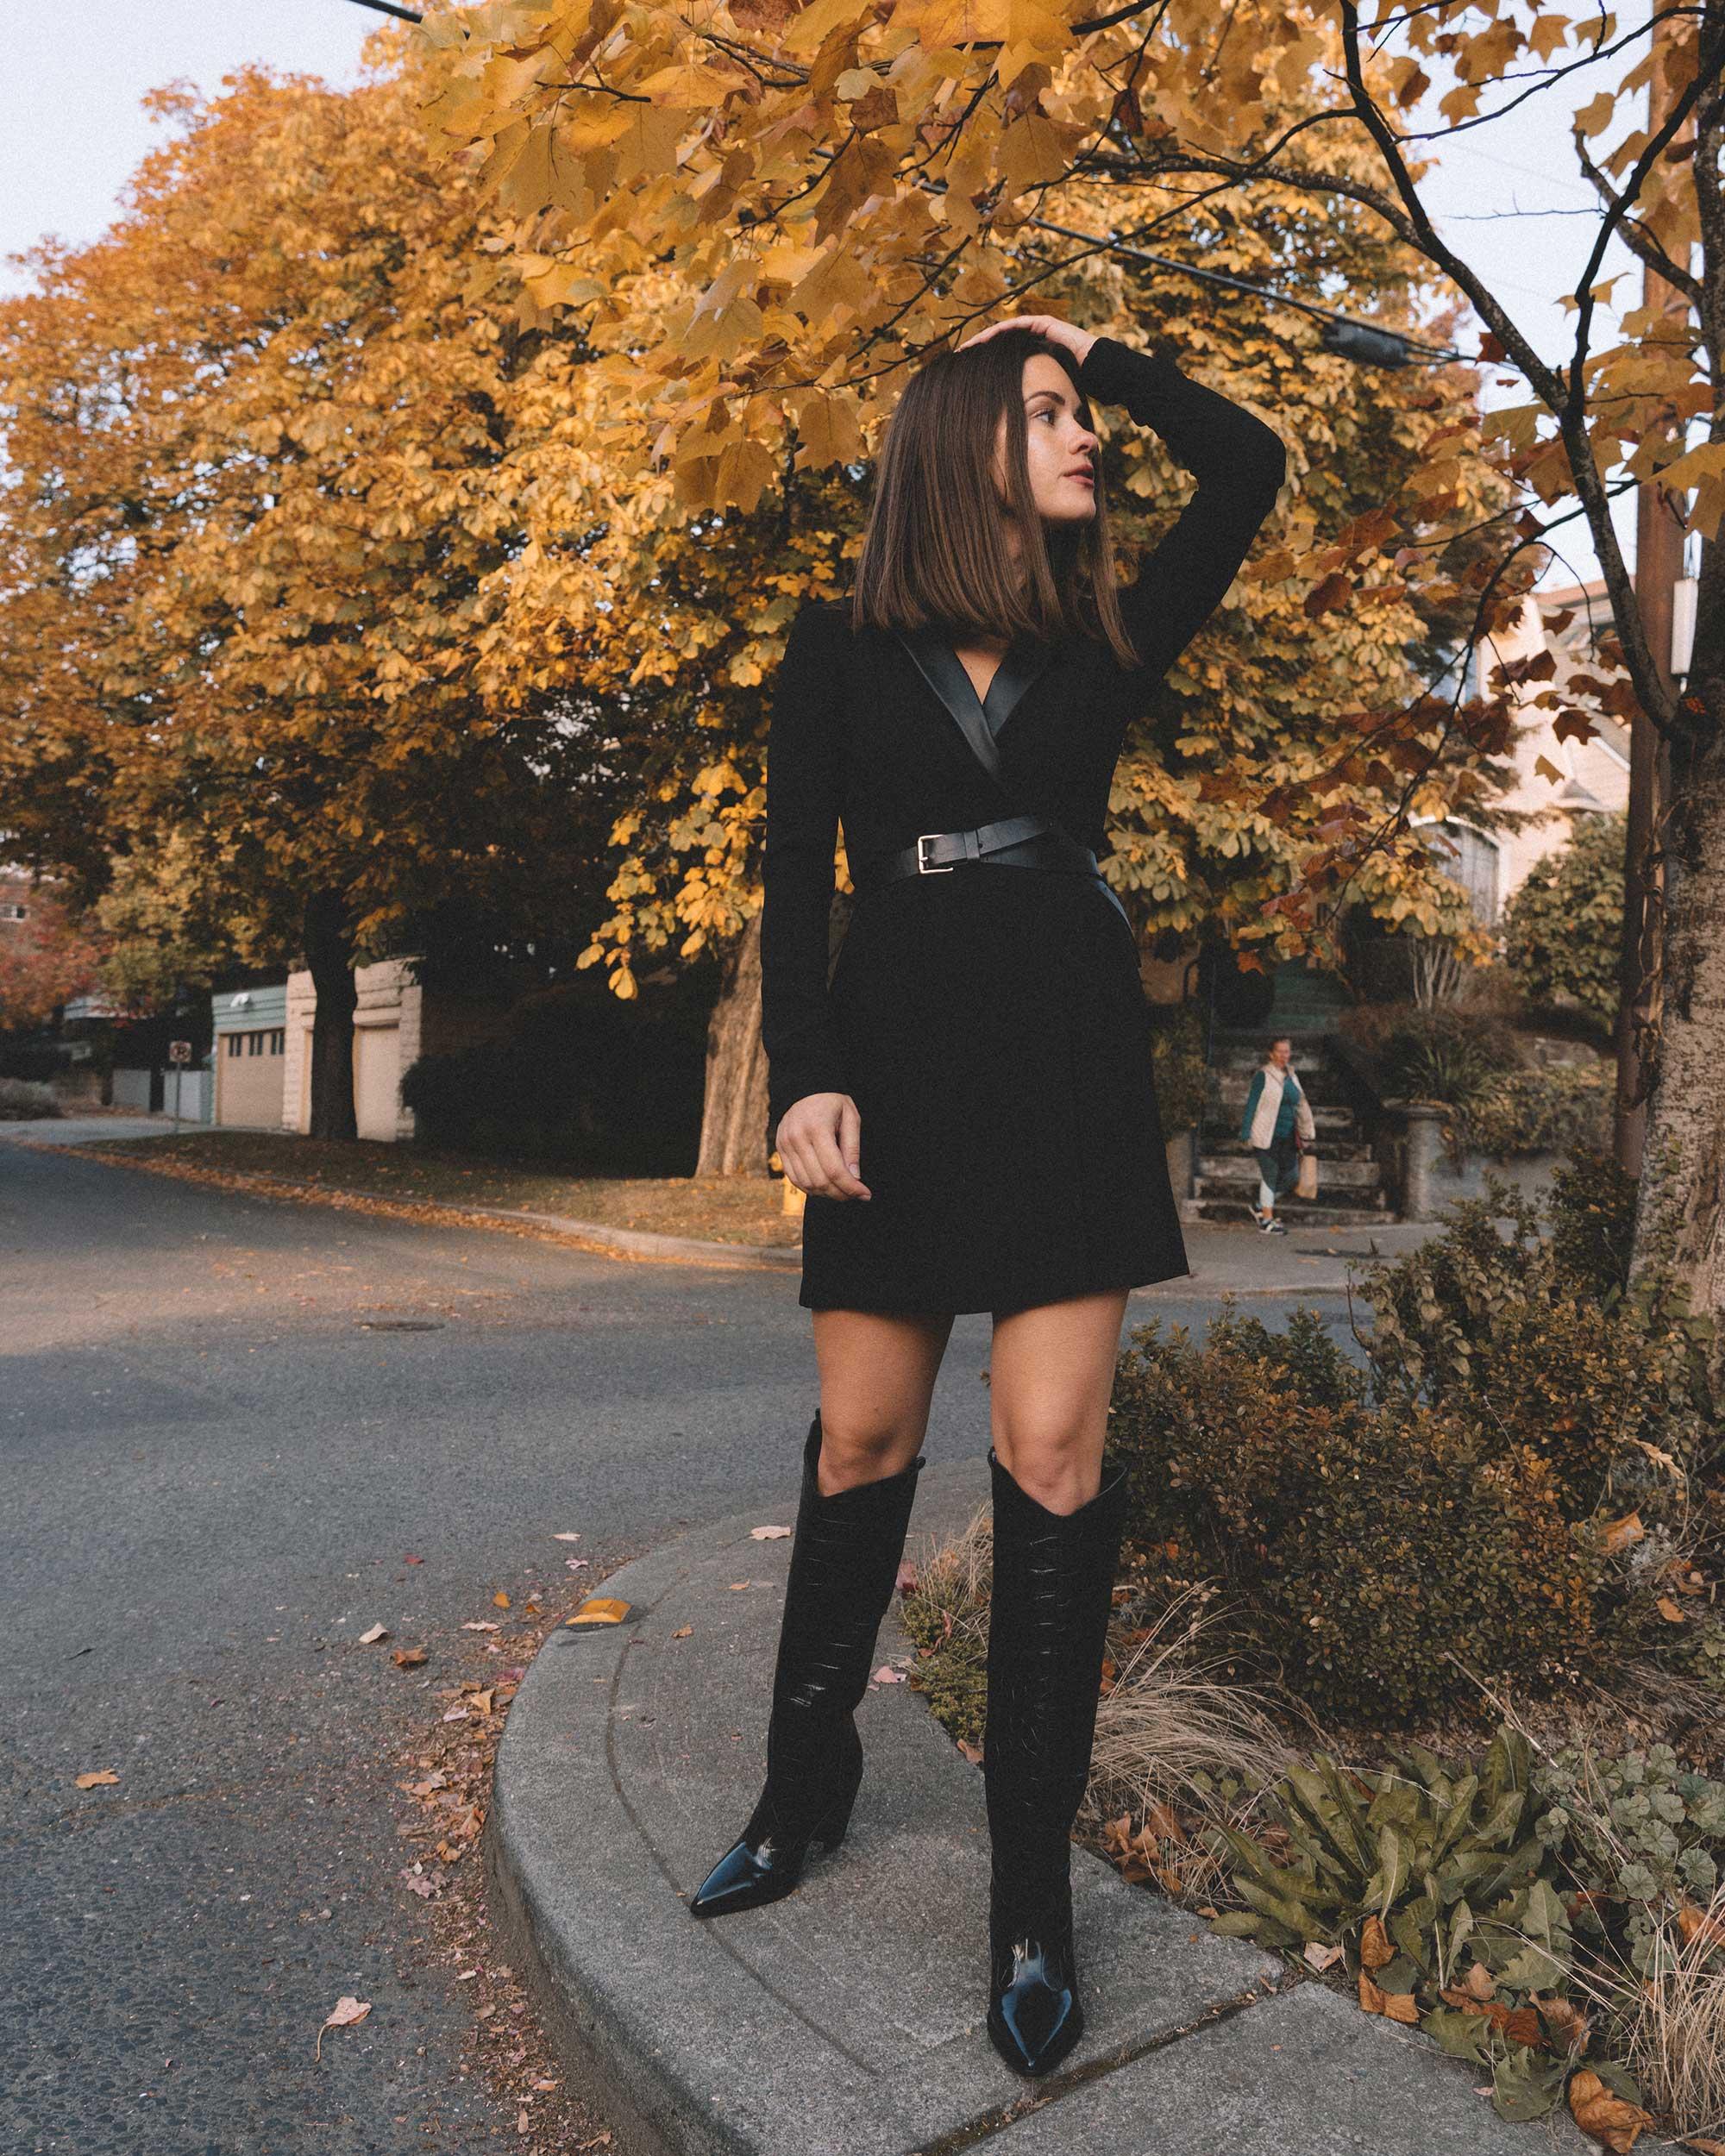 bcbgeneration blazer dress in black, Sigerson Morrison Karida Black Leather Knee High Boot, fall outfit 6.jpg